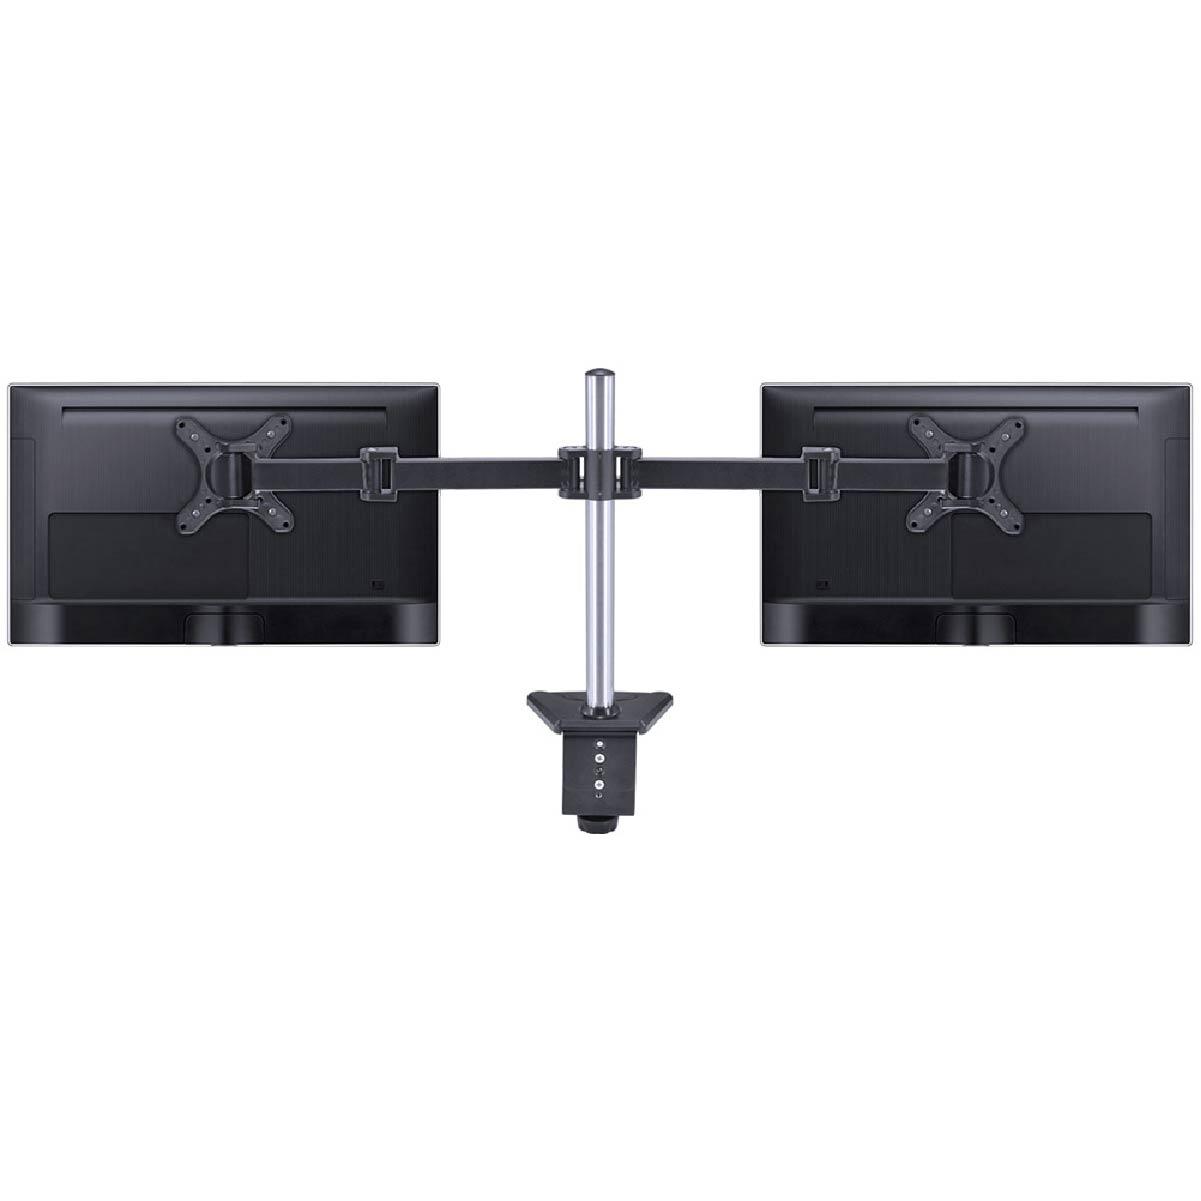 Suporte Articulado Para 2 Monitores Vinik 13 A 32 Sm310c